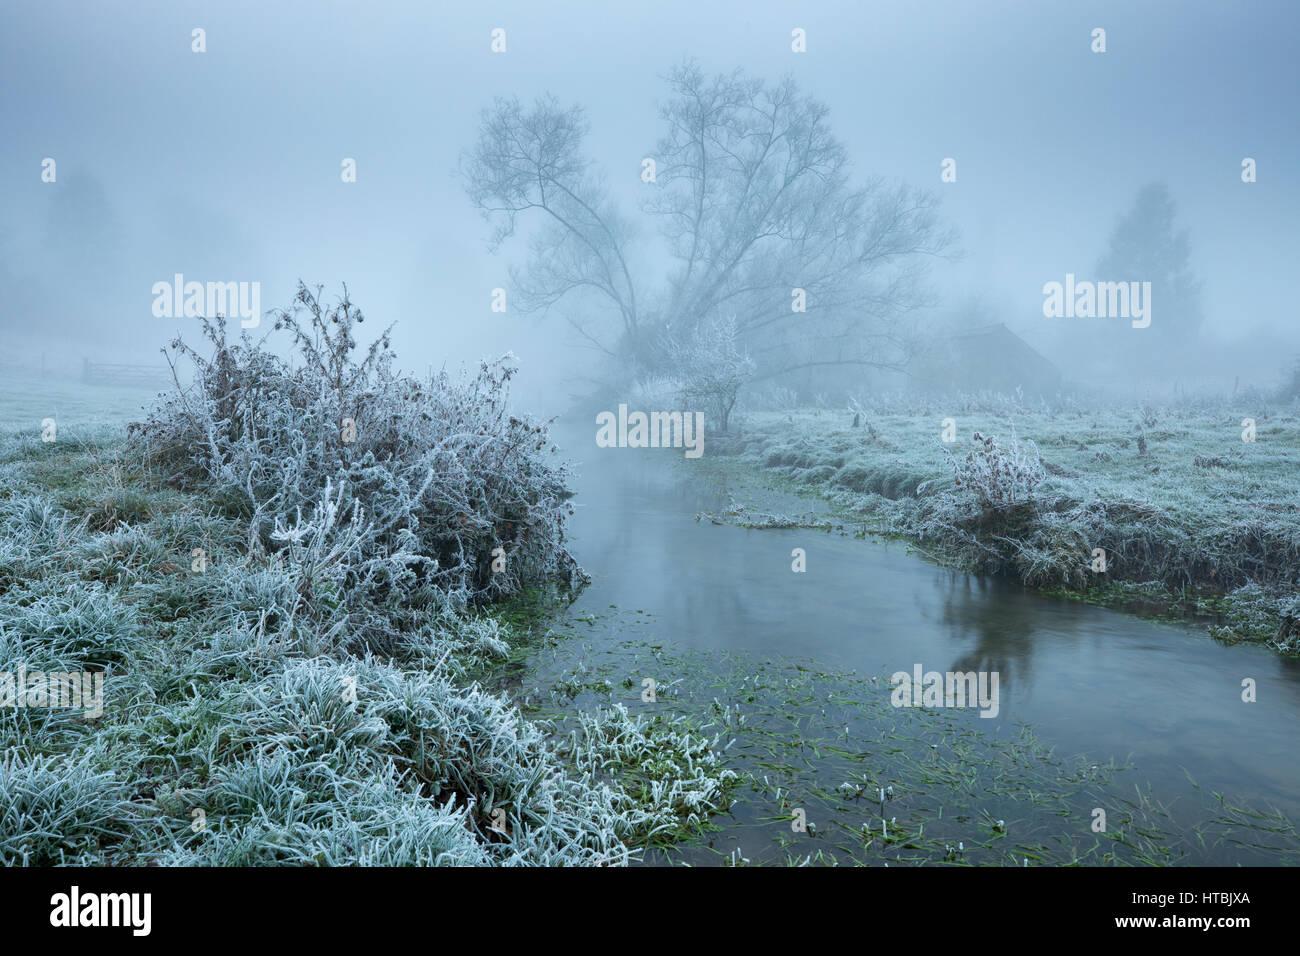 A misty, frosty morning on the banks of the Gascoigne, Kingsbury, Milborne Port, Somerset, England, UK Stock Photo